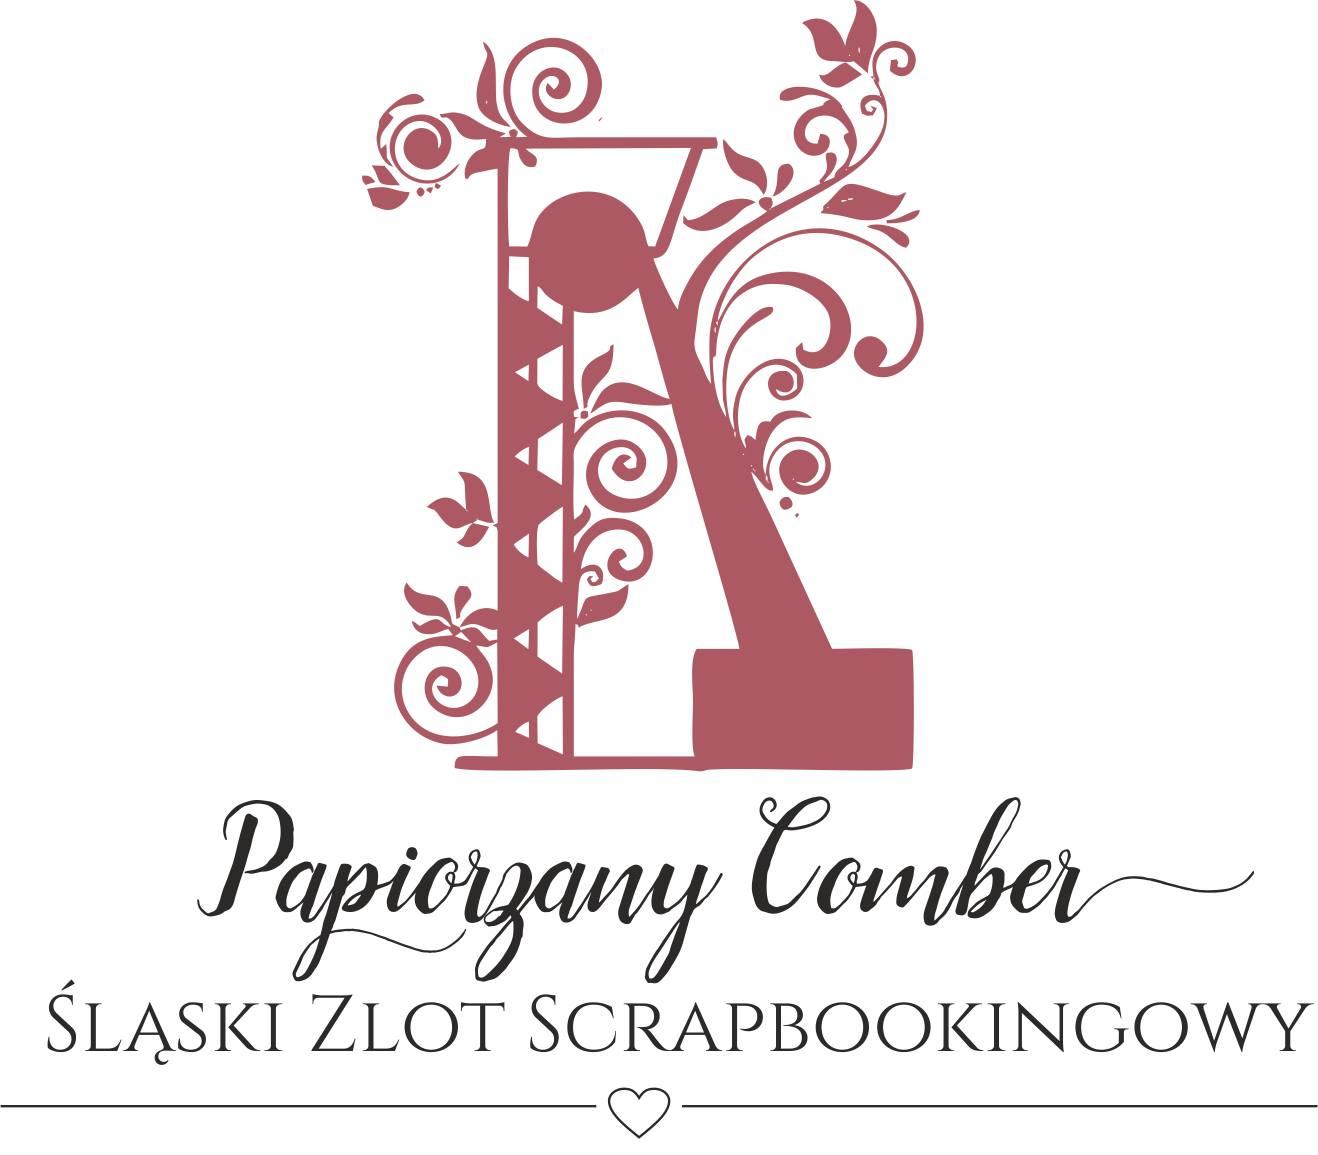 Papiorzany Comber, Katowice